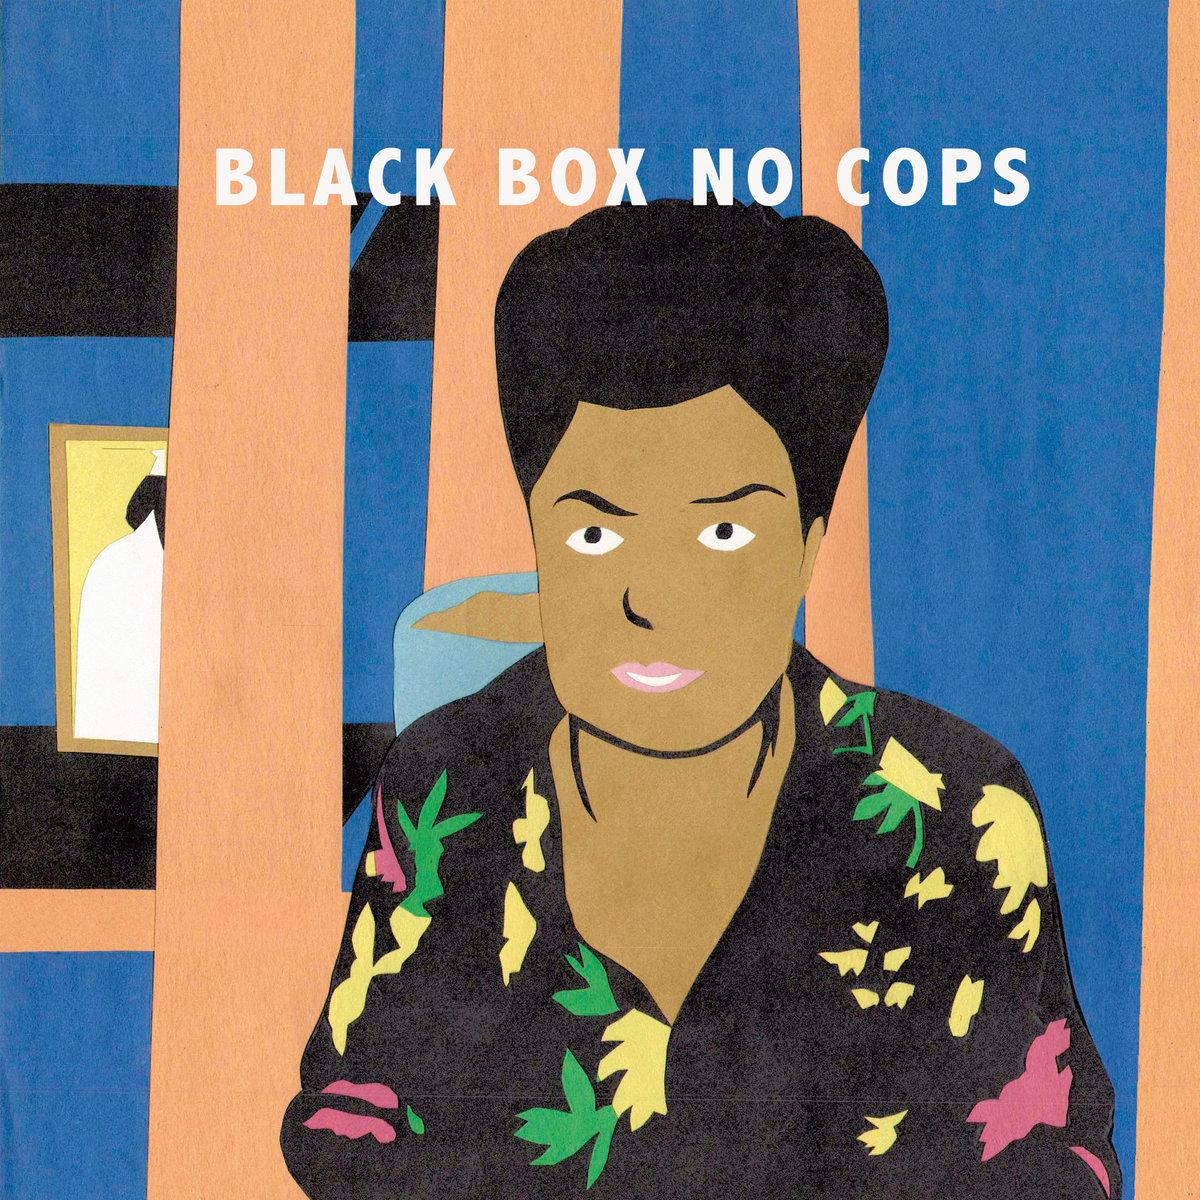 2MR-037 – Fit Of Body – Black Box No Cops LP